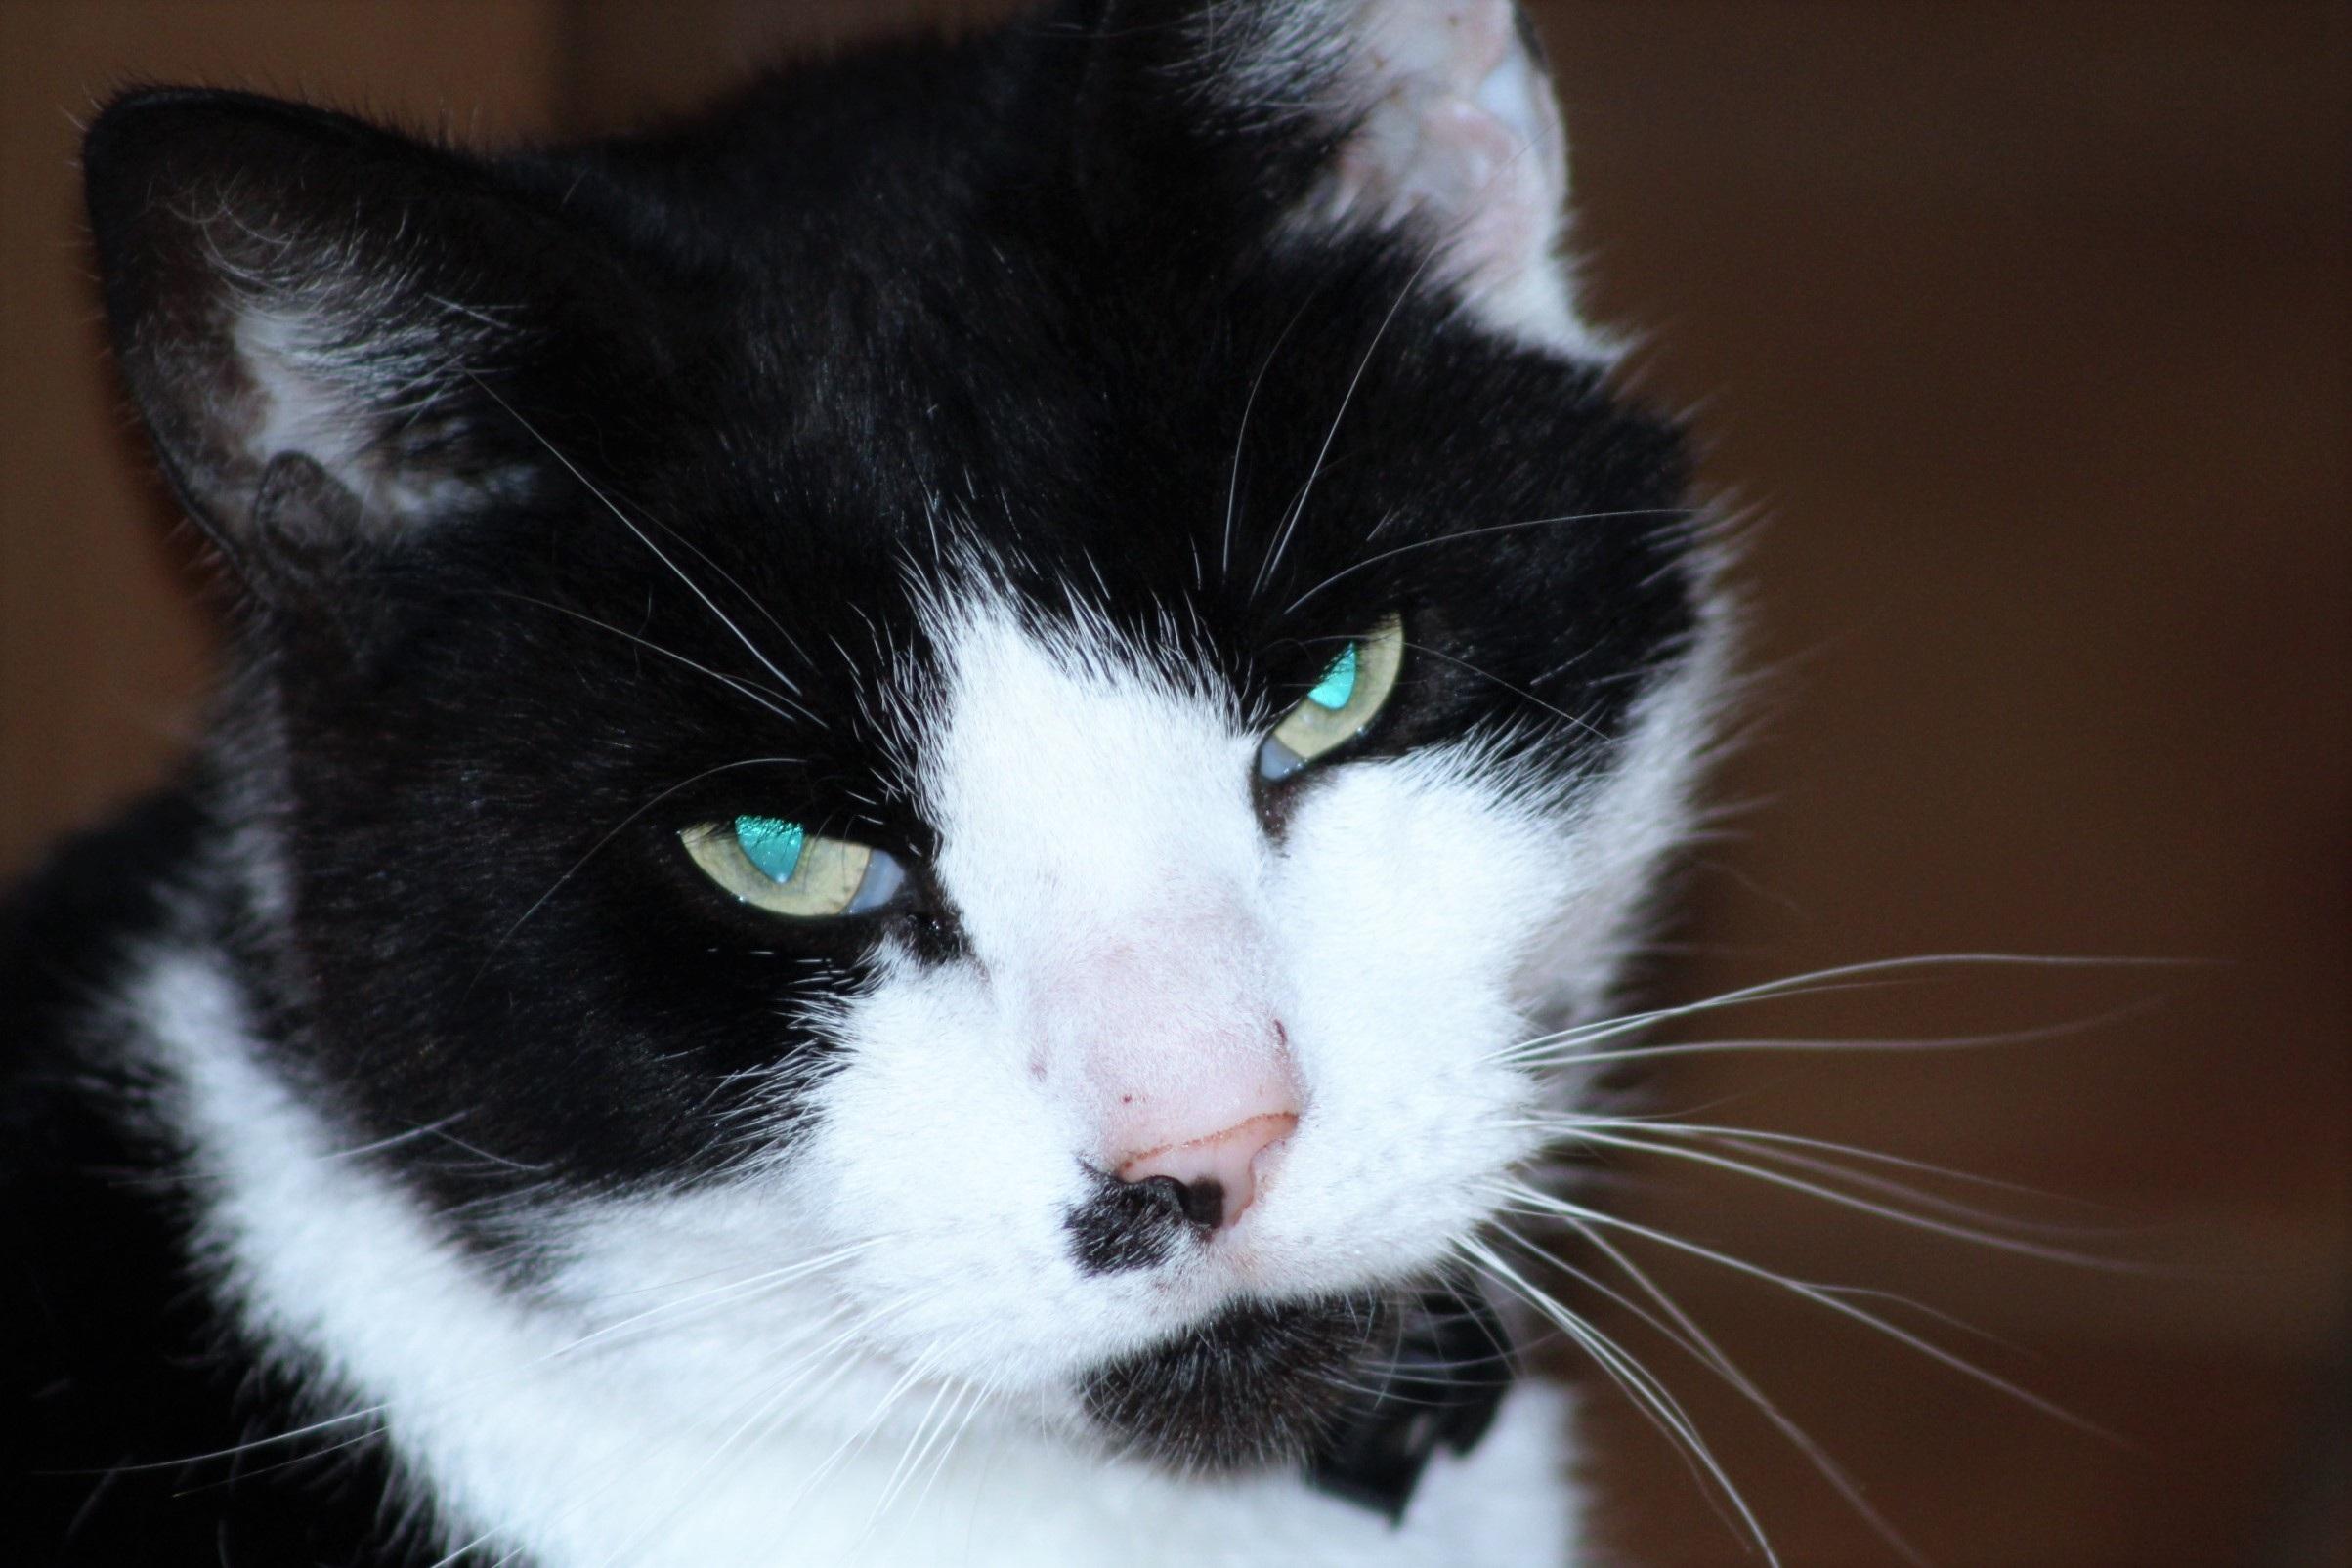 Free Images : black and white, animal, pet, kitten, black cat, close ...